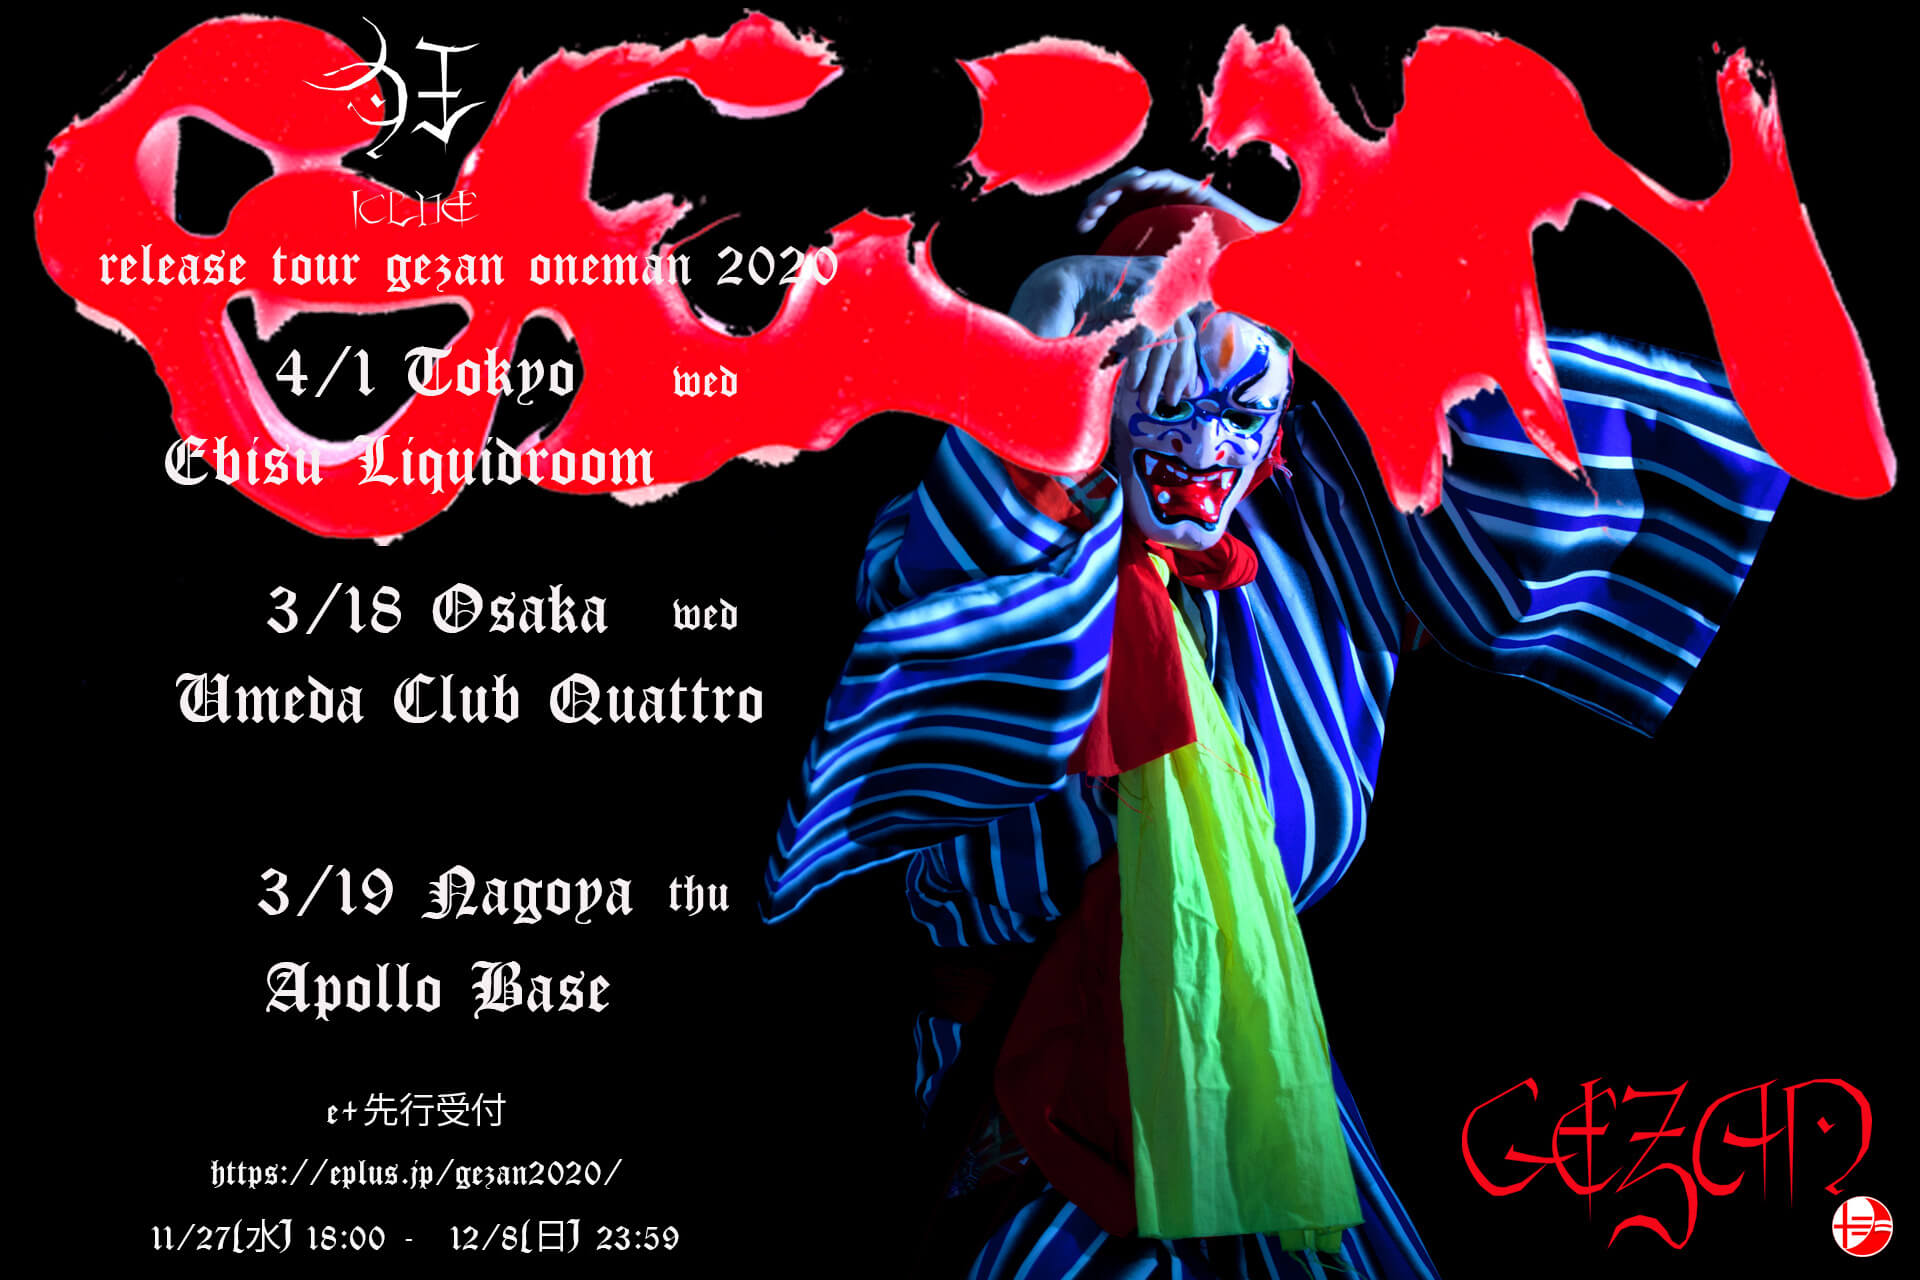 GEZAN、5th ALBUM『狂(KLUE)』を自主レーベル十三月よりリリース|東名阪を周遊するリリースツアーも開催 music191126_gezan_1